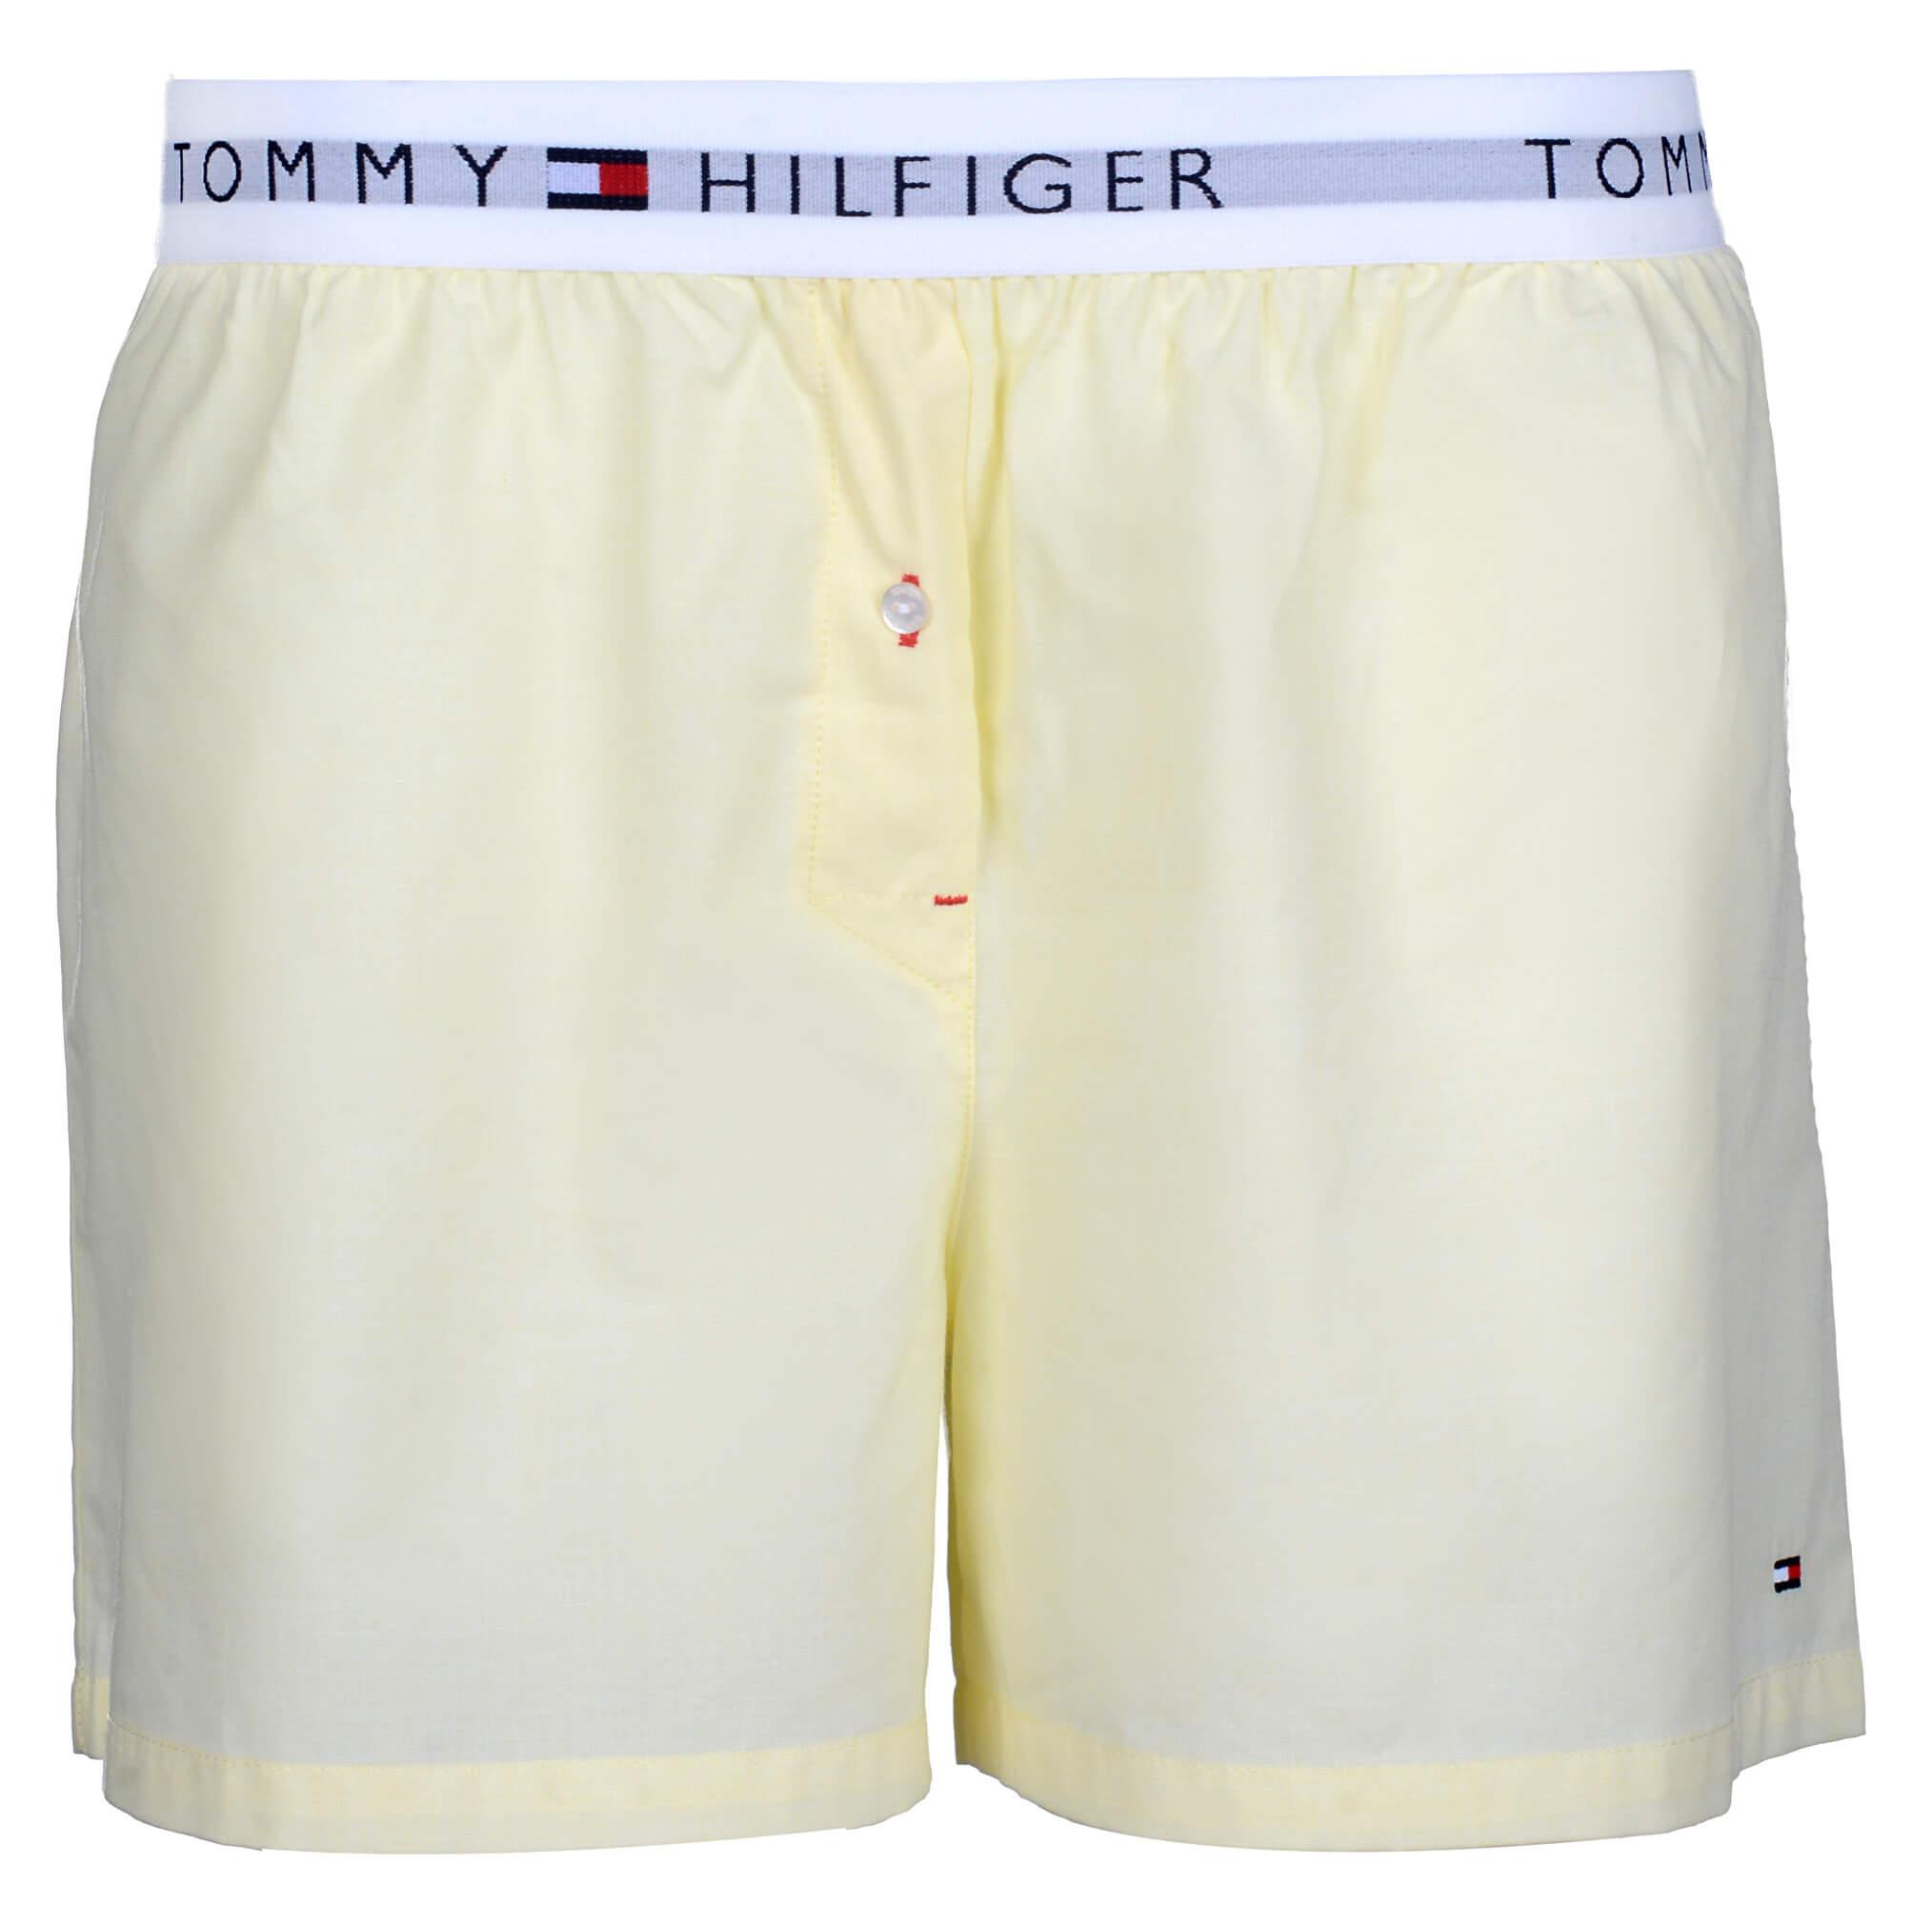 Tommy Hilfiger Dámské boxerky Woven Boxer End On End Yellow Cream UW0UW00691 -708 3b24757b15